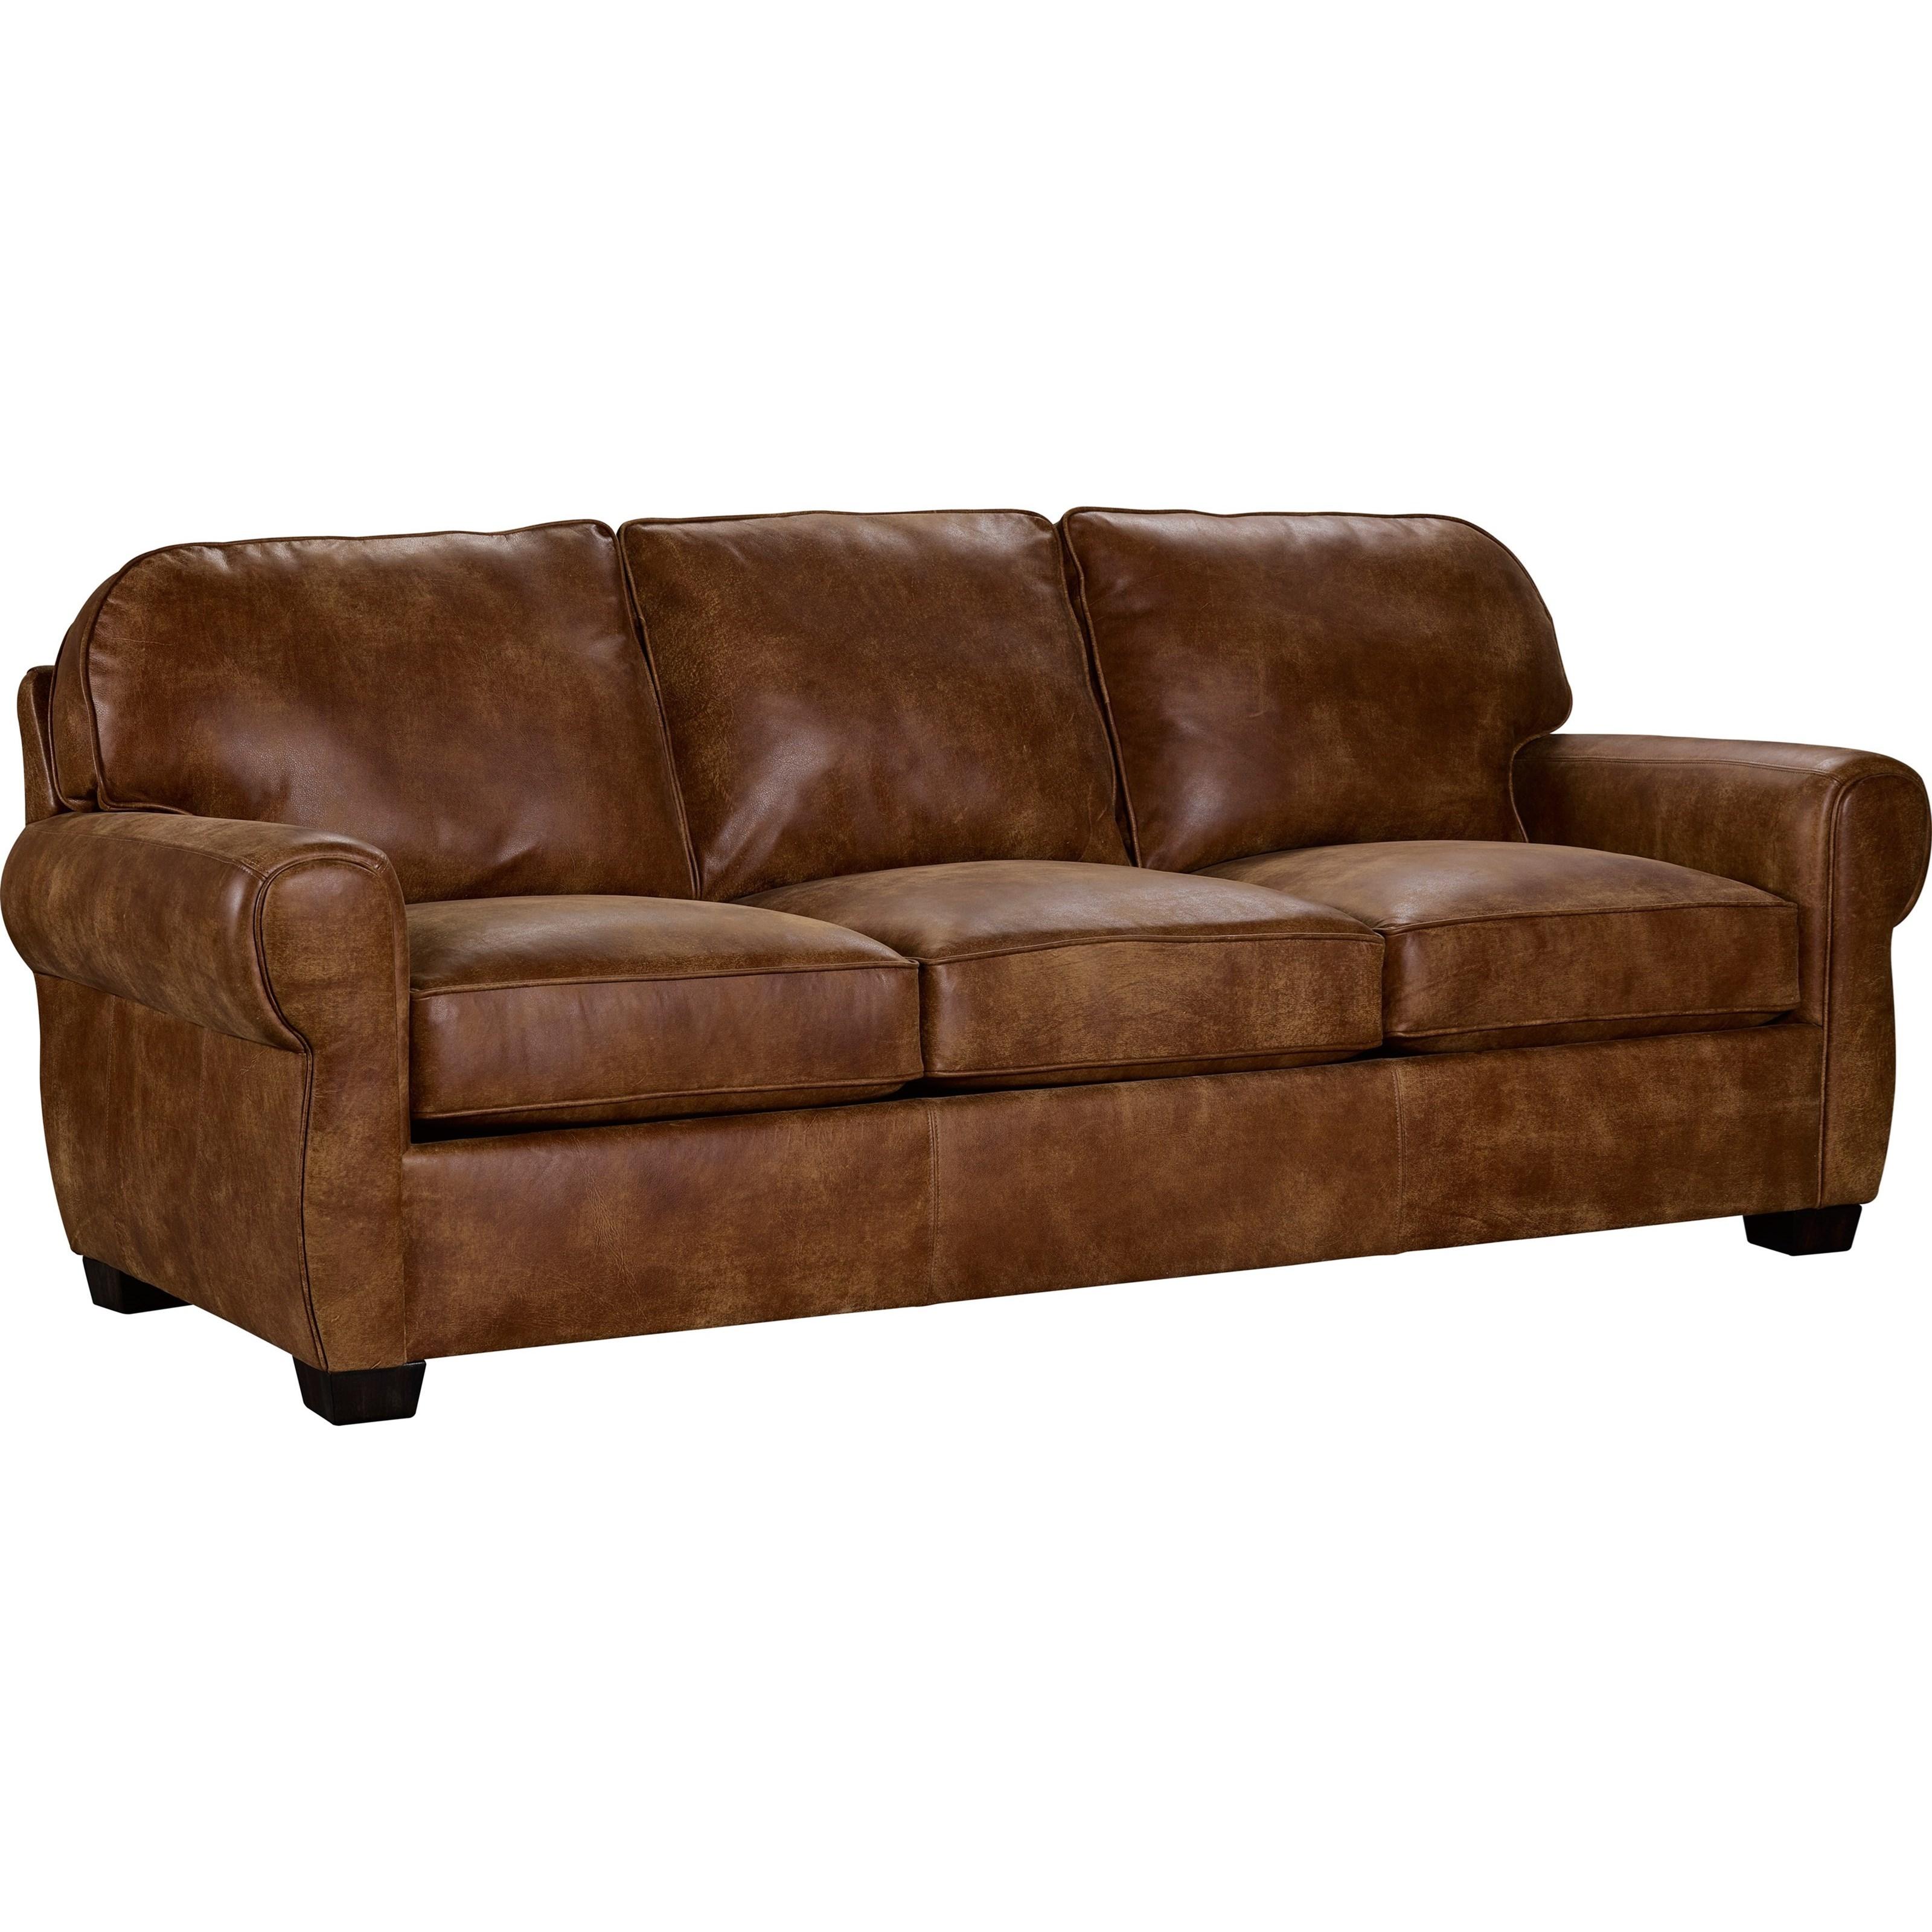 Broyhill Furniture VedderSofa